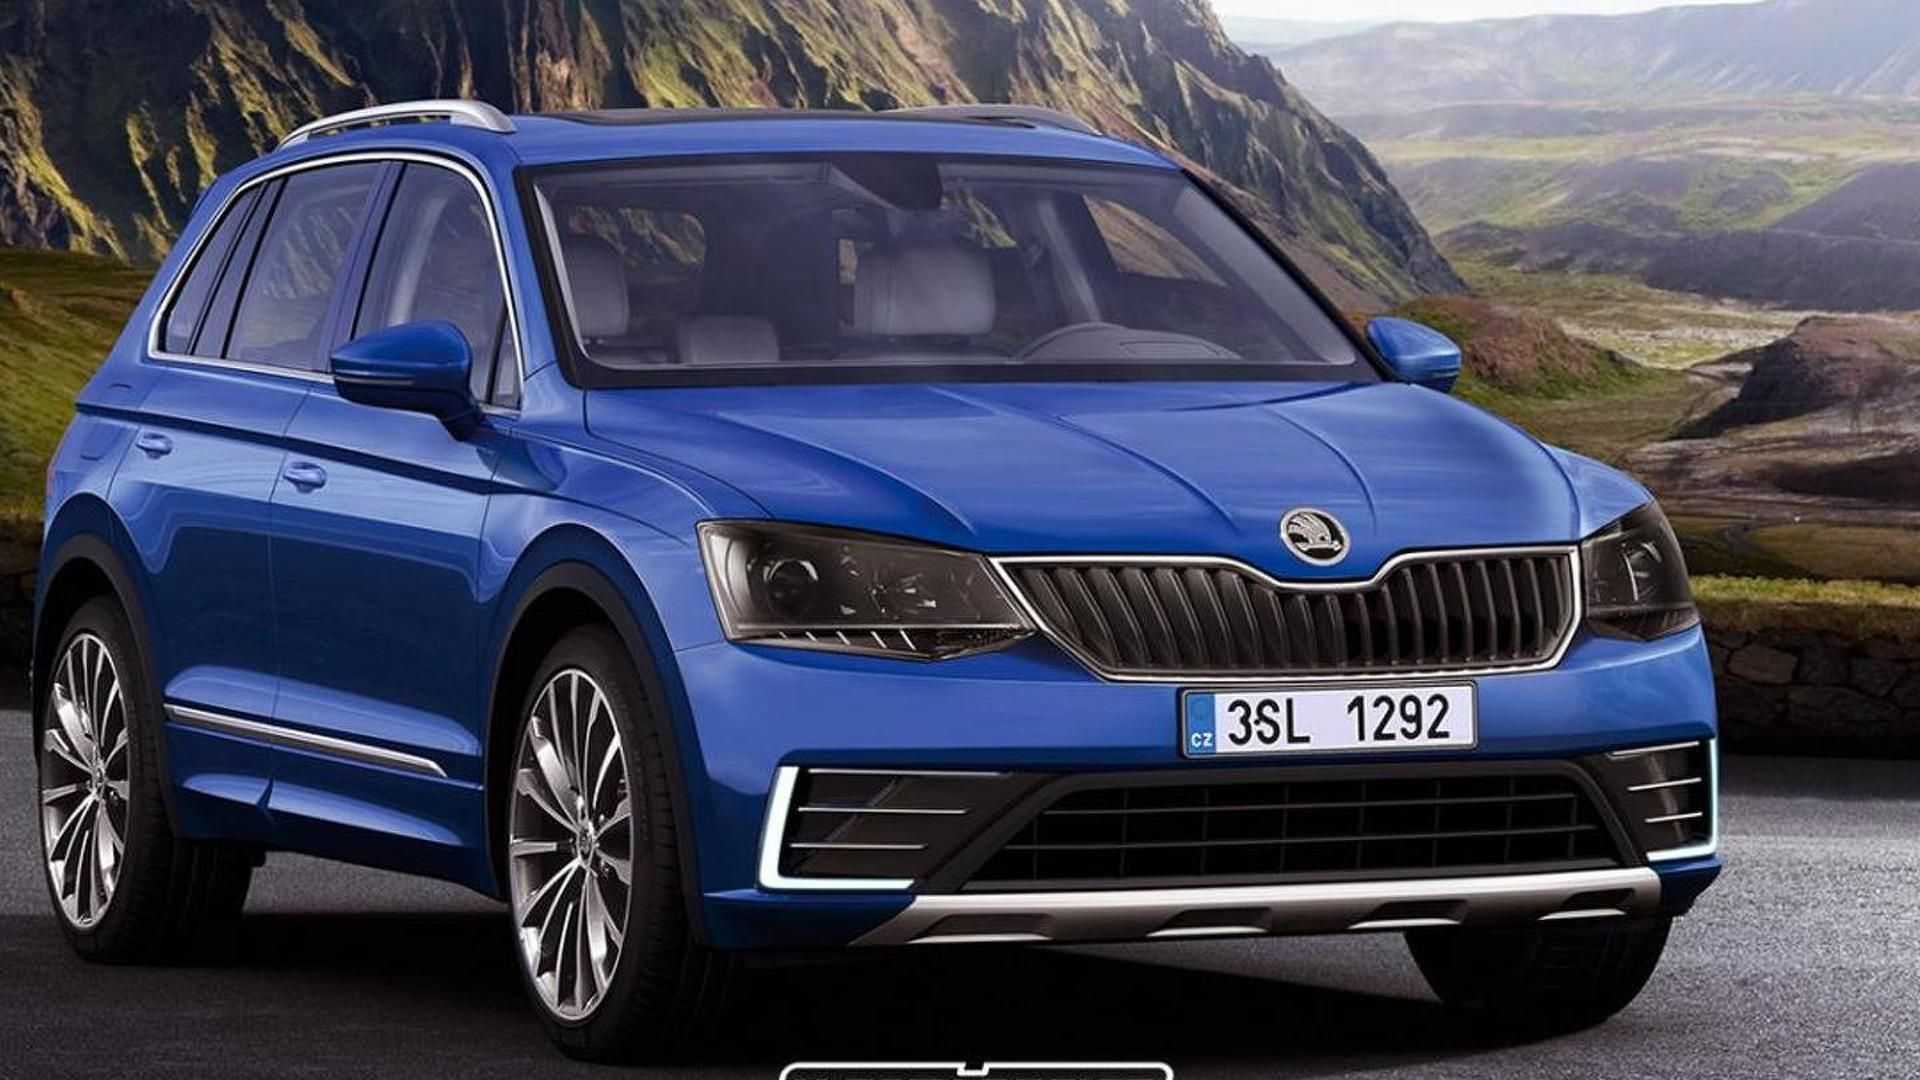 2020 Skoda Yeti New Model and Performance Škoda yeti